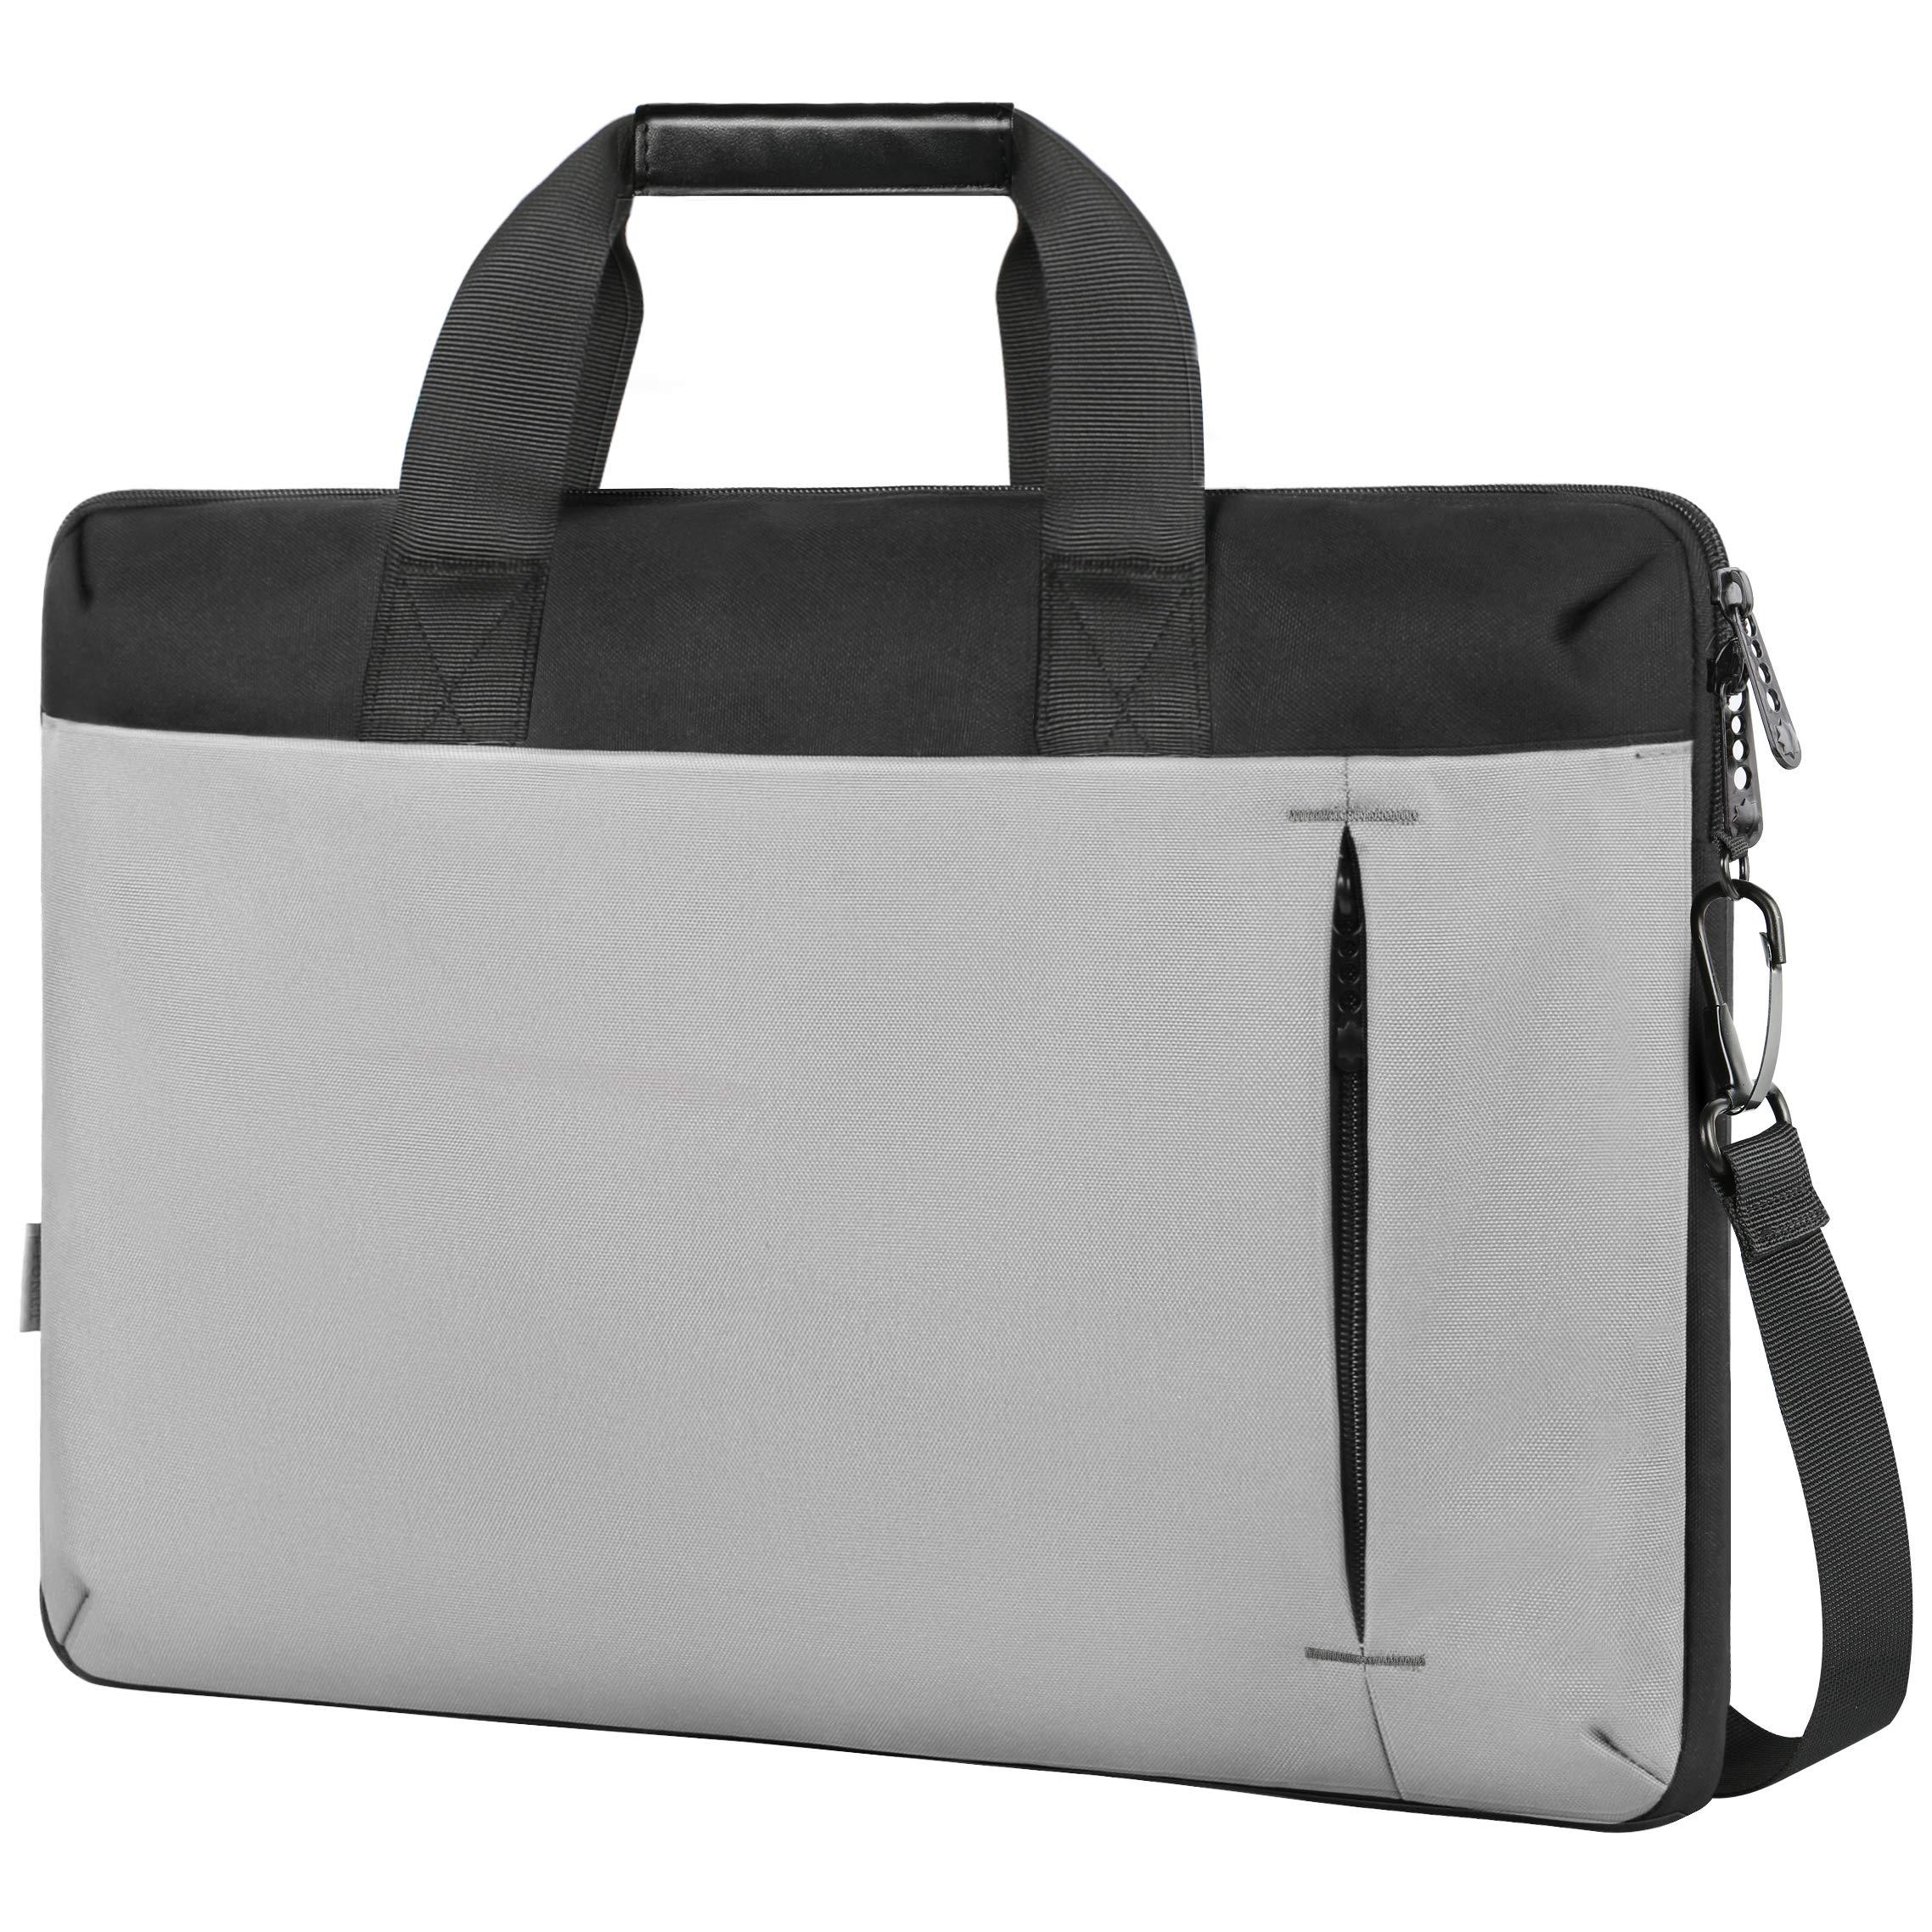 Slim Laptop Bag,17.3 Inch Laptop Carrying Case Compatible for HP Computer,Large Briefcase Sleeve for Women Men,Waterproof Messenger Shoulder Bag Compatible for 17 15.6 in Dell Lenovo Notebook,Gray